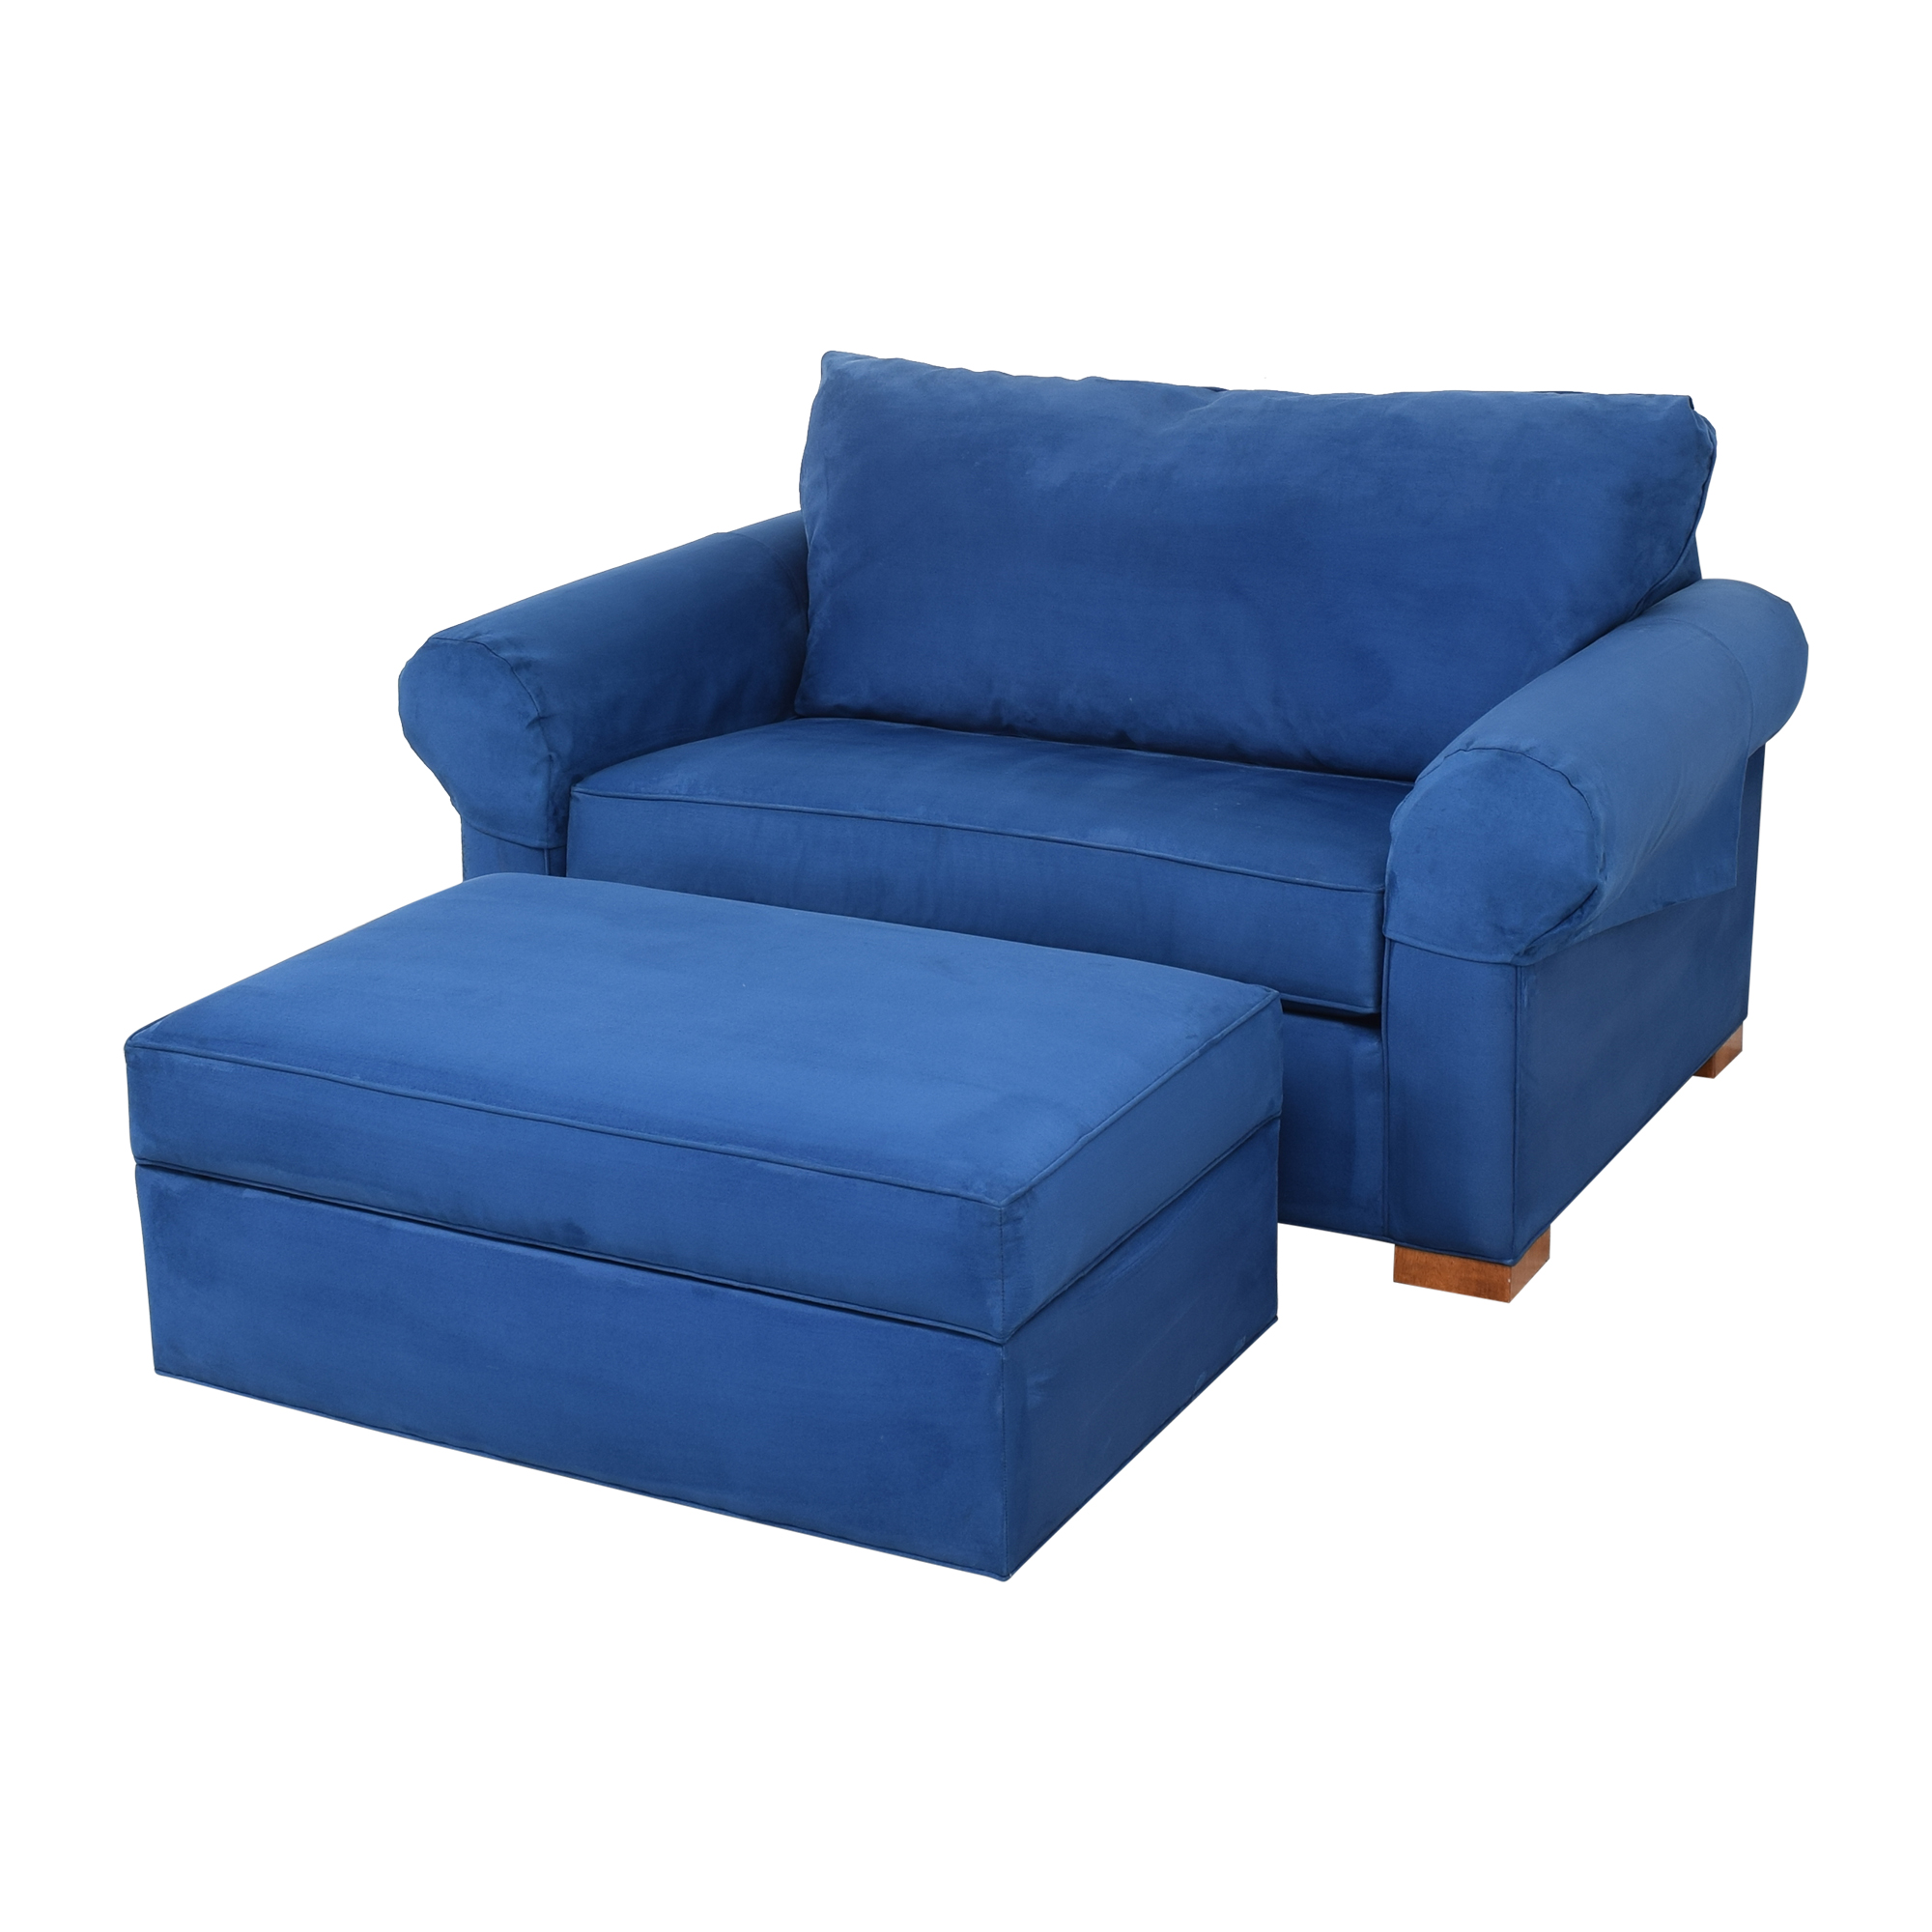 Ethan Allen Ethan Allen Twin Sleeper Marina Chair with Ottoman on sale